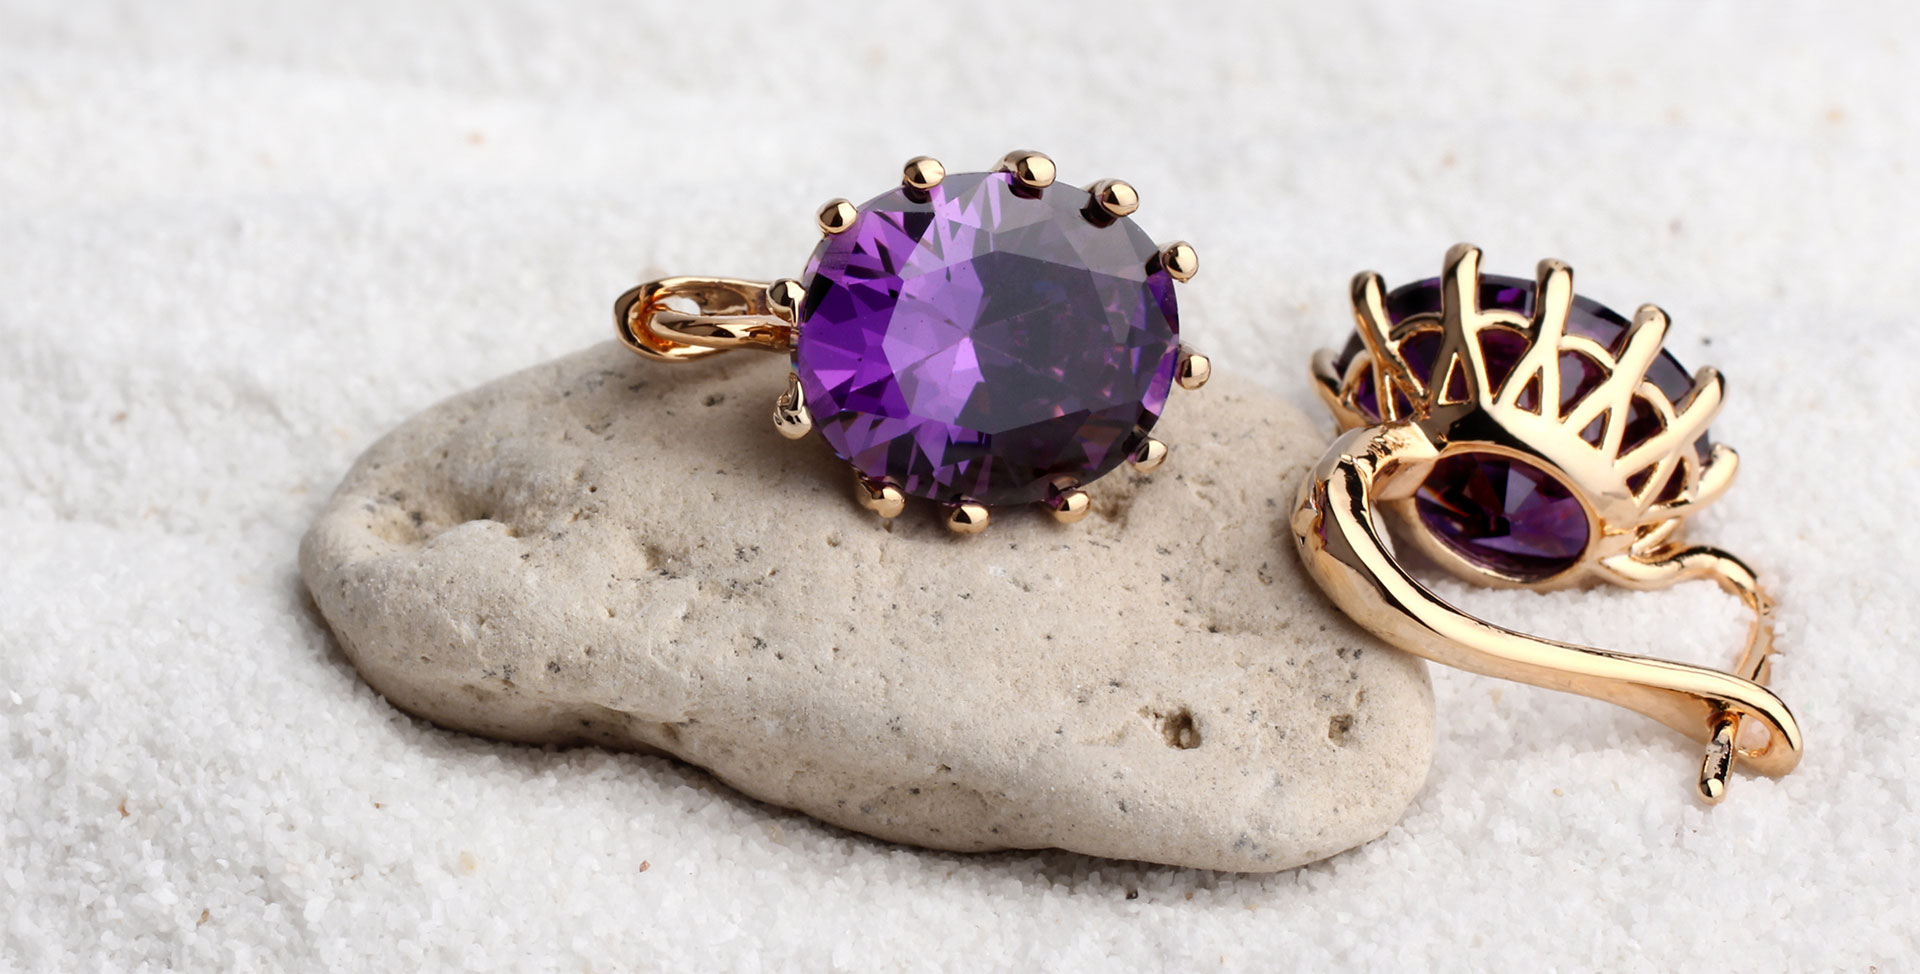 Jewellery Marketing Image Sand